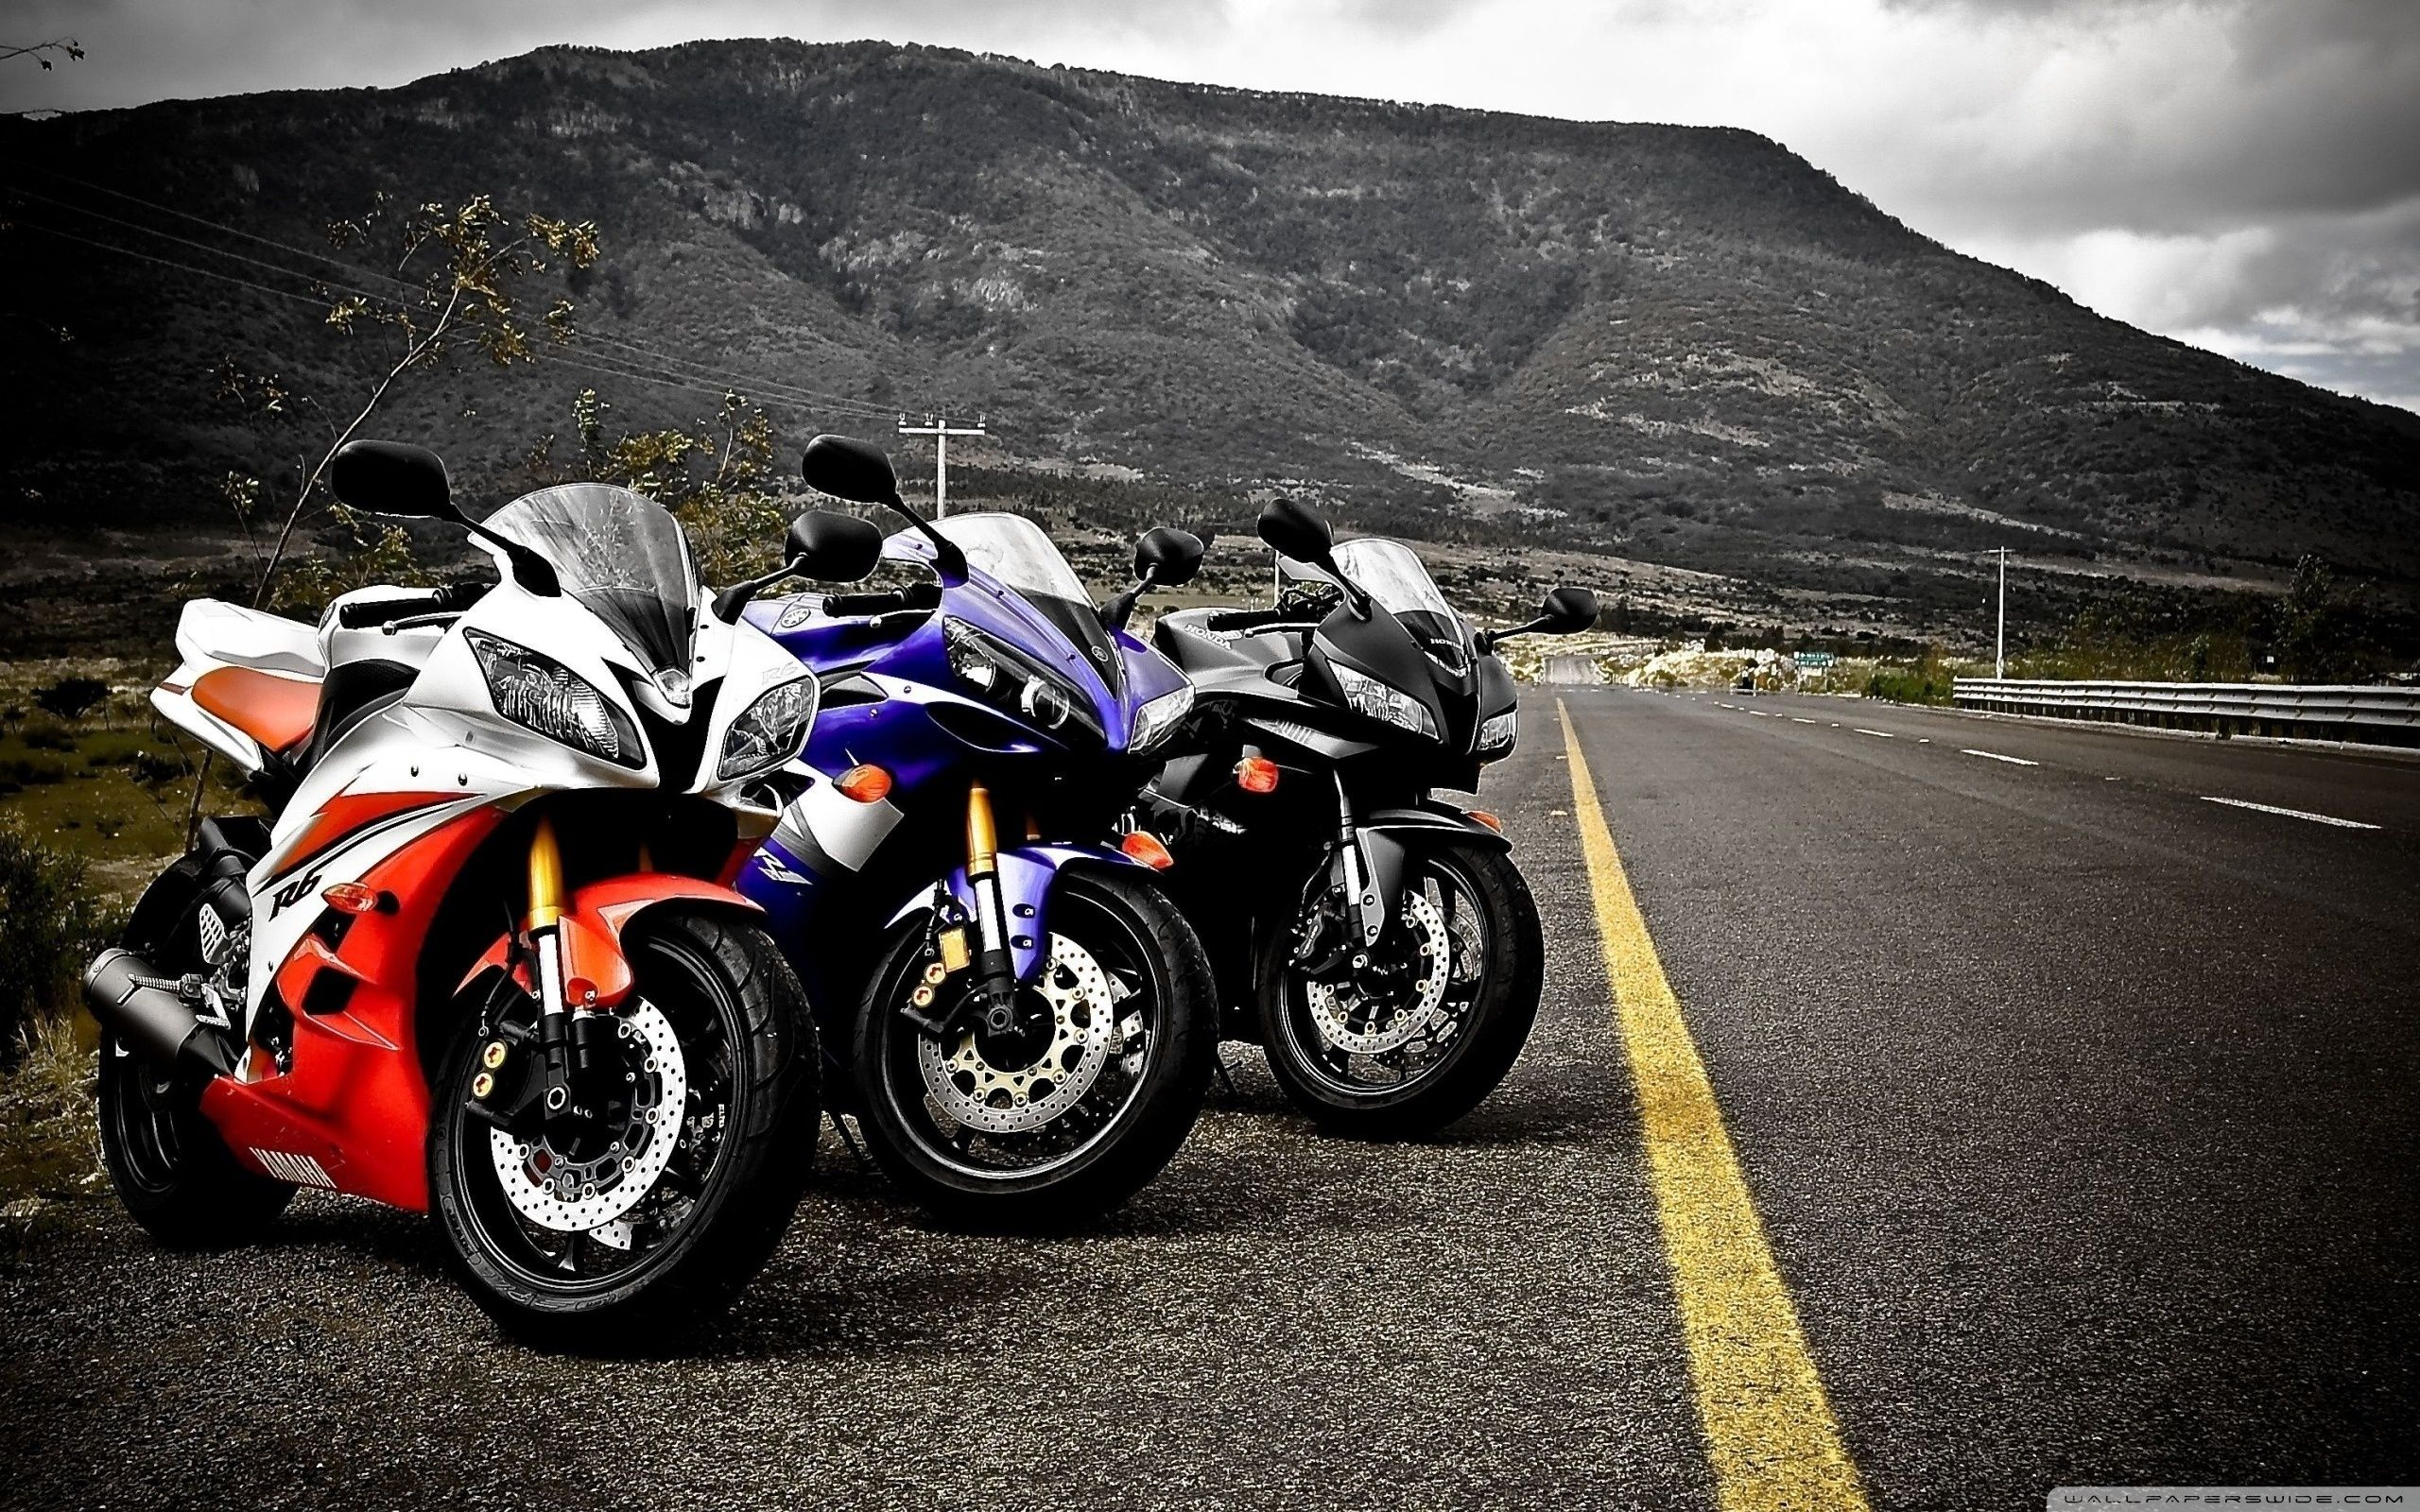 Honda Motorcycle Wallpapers   Top Honda Motorcycle 2560x1600